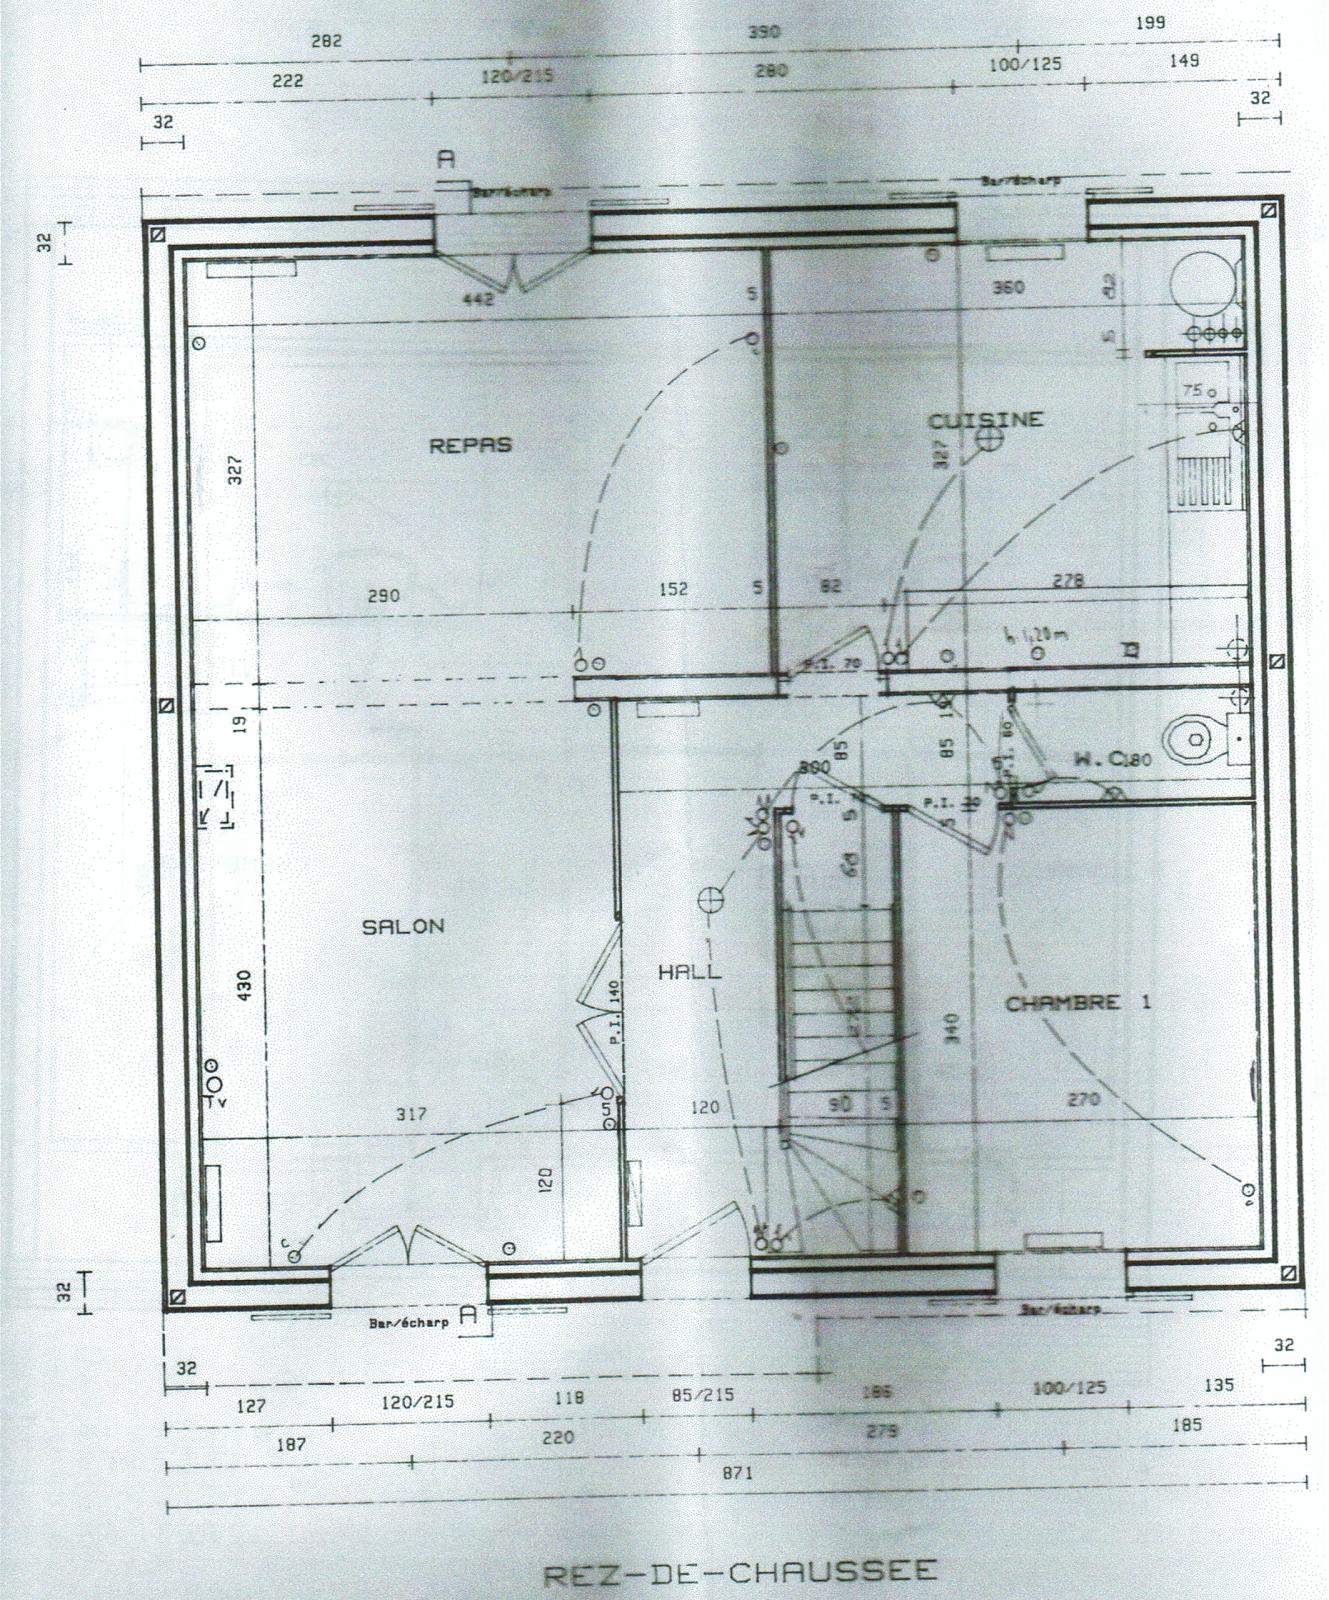 chauffage climatisation pompe a chaleur daikin air air prix. Black Bedroom Furniture Sets. Home Design Ideas